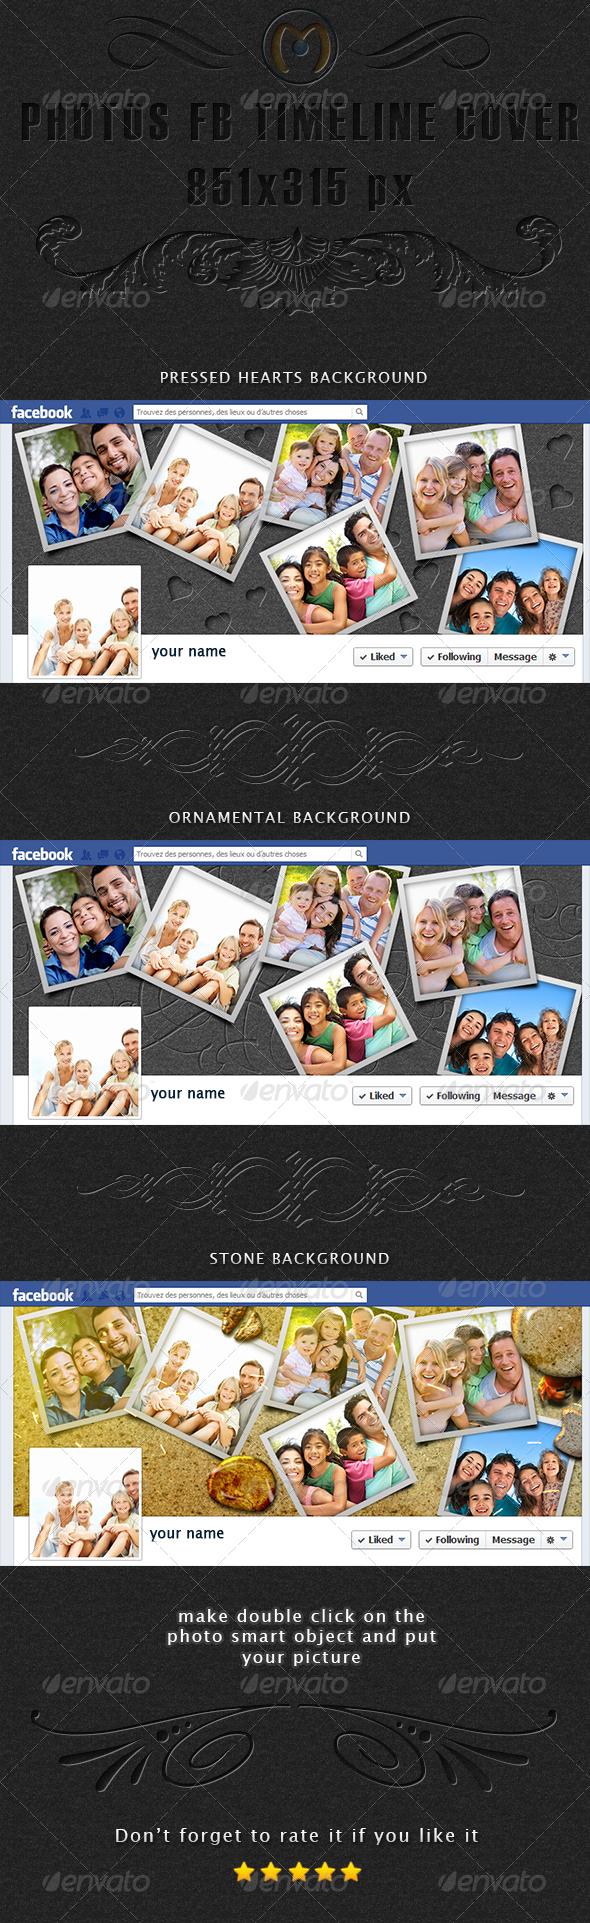 GraphicRiver Photos Facebook Timeline Cover 6815287